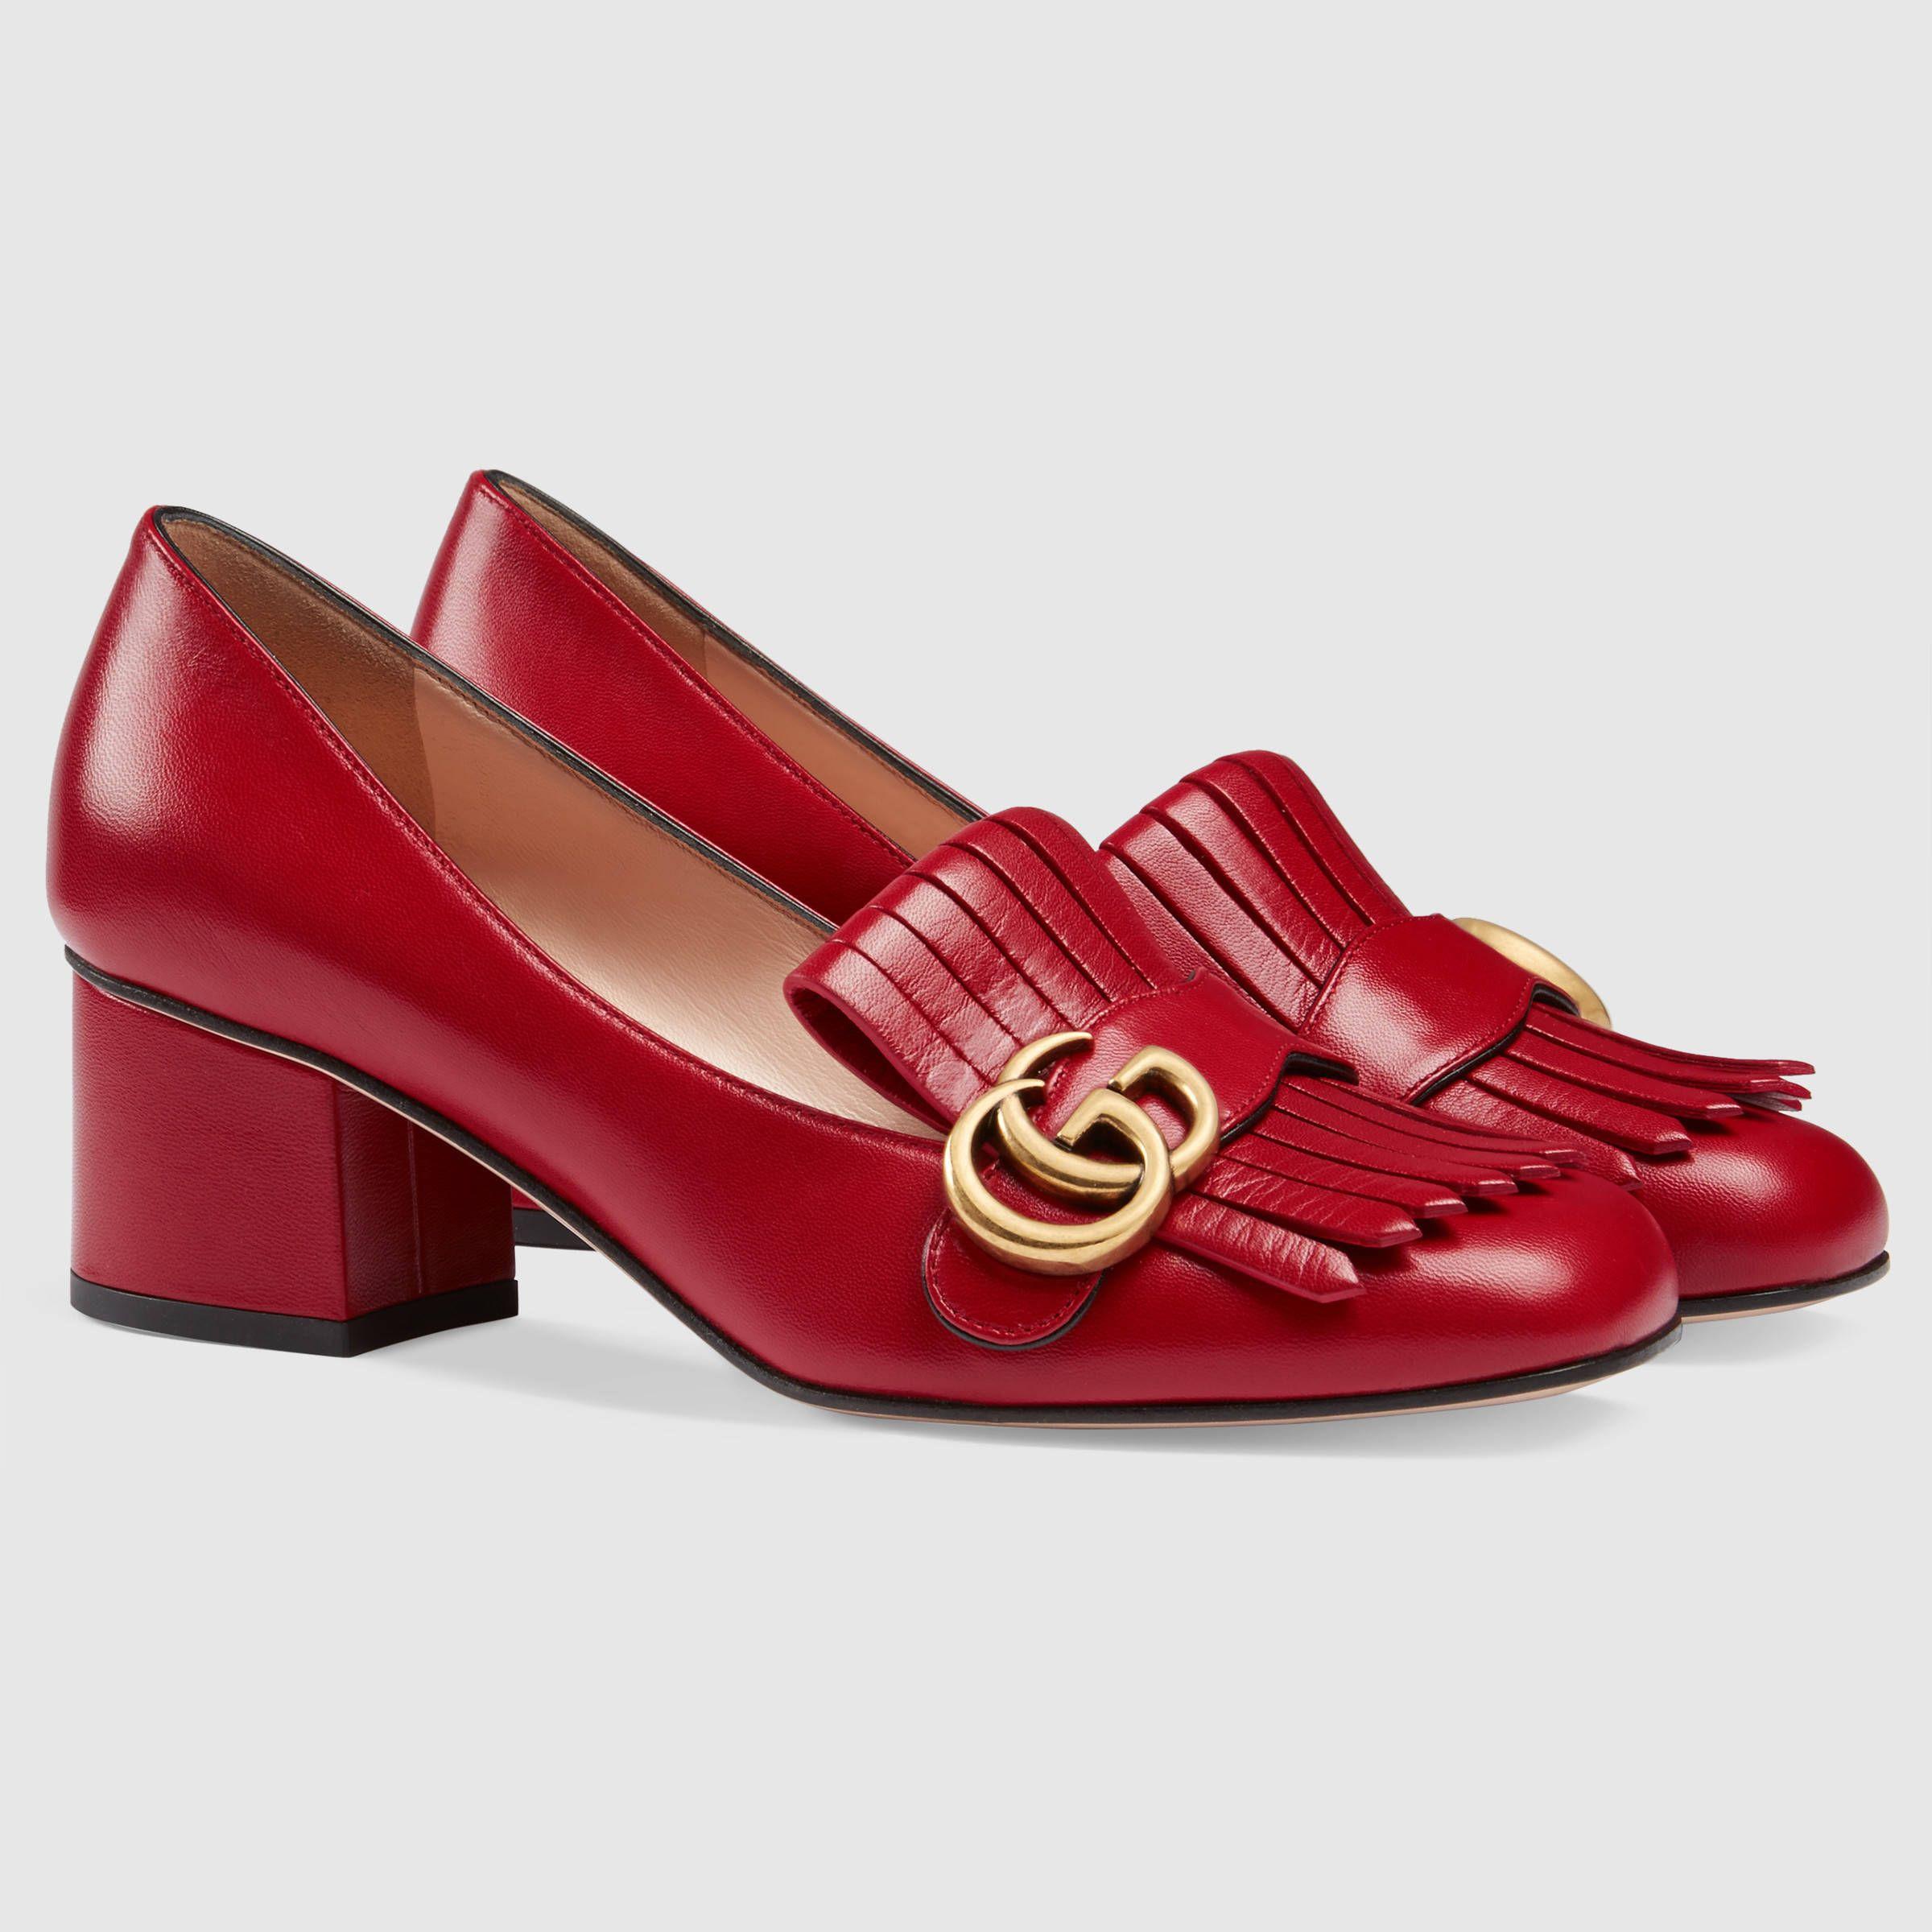 Leather mid-heel pump - Gucci Women's Pumps 408208C9D006433